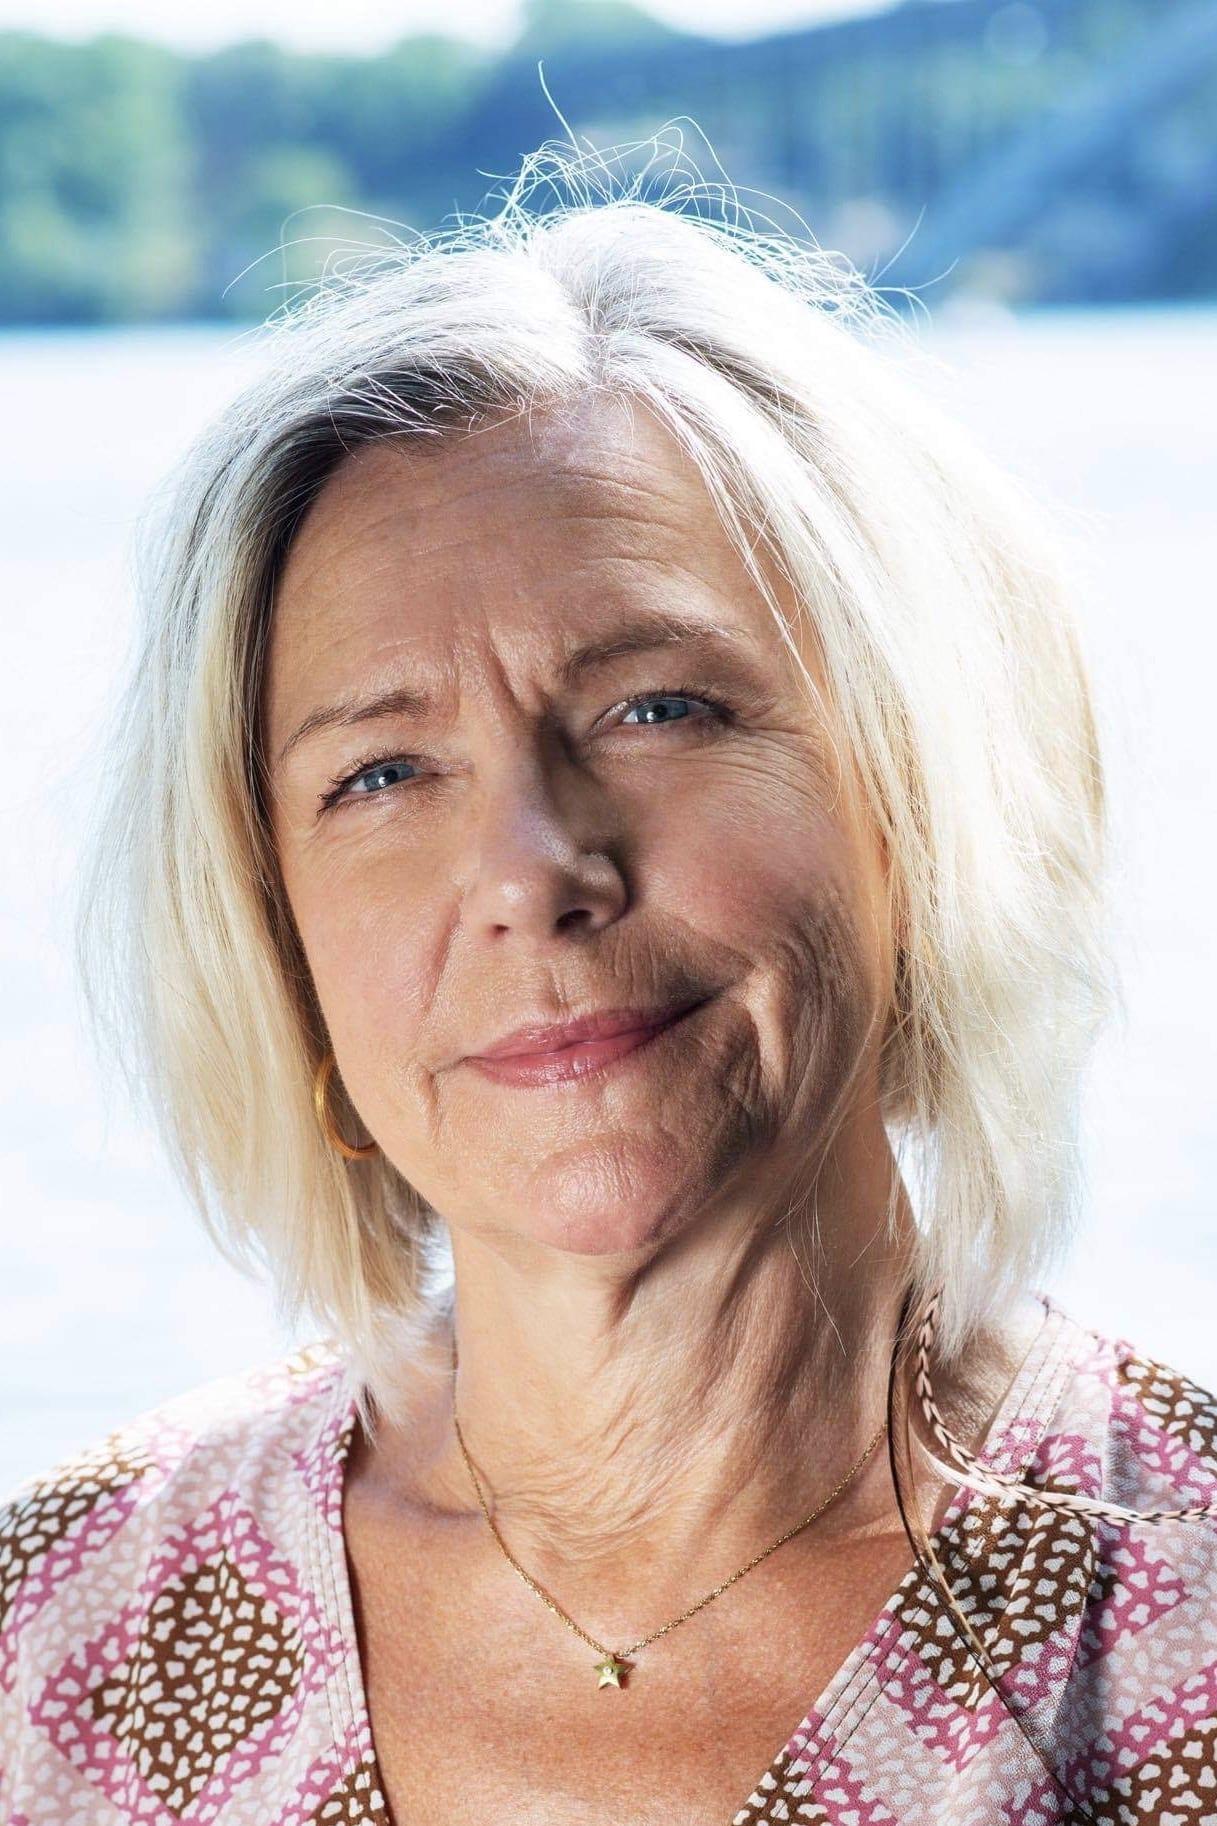 "<a href=""https://halsoporten.se/halsoportens-terapeuter-avsnitt-1-cina-friberg-frank/"">Cina Friberg Frank</a>, Stockholm"